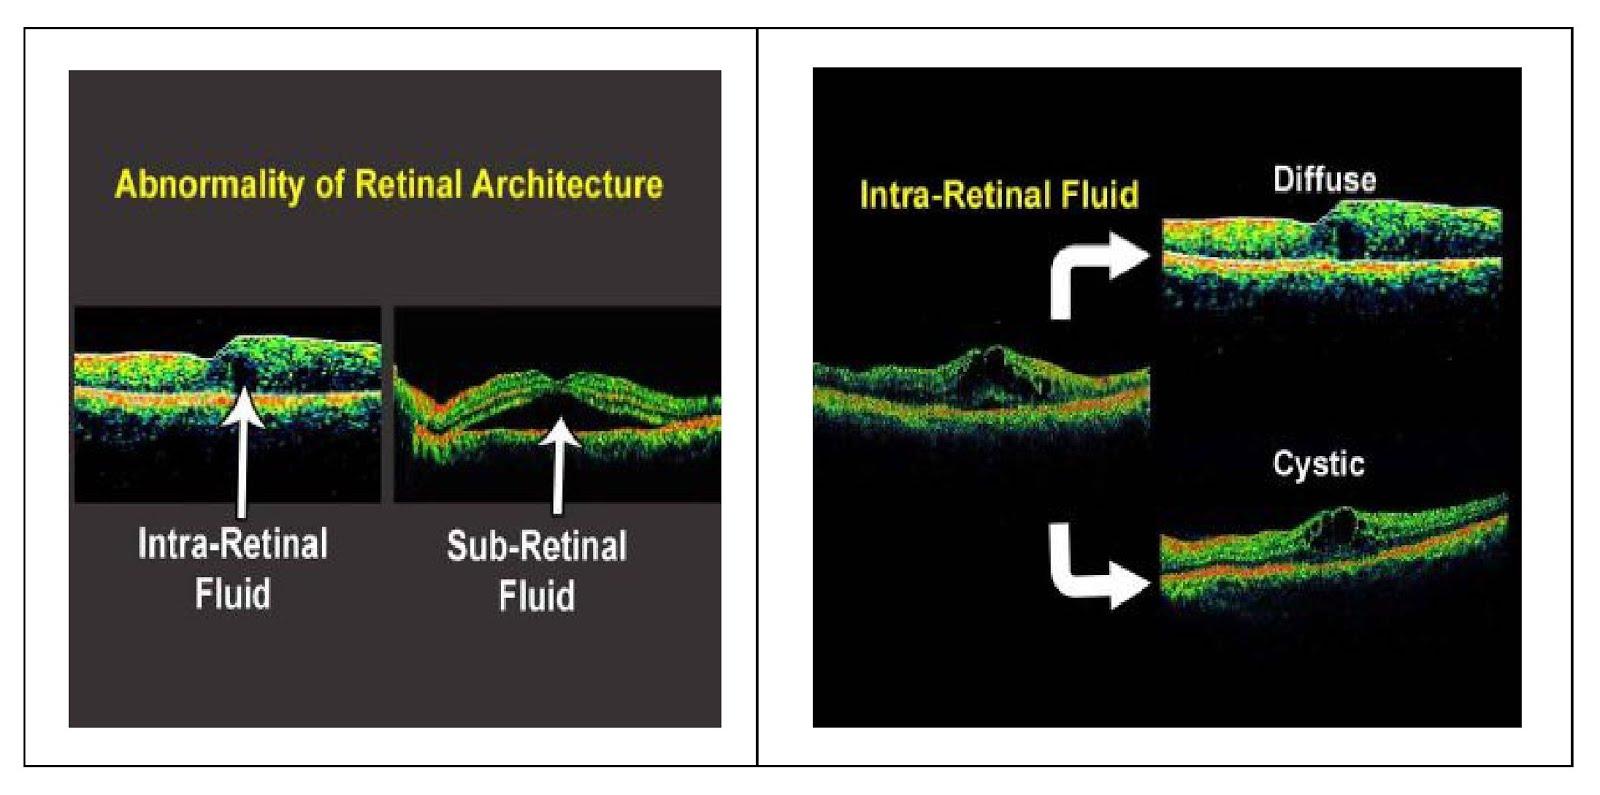 Retinal architecture